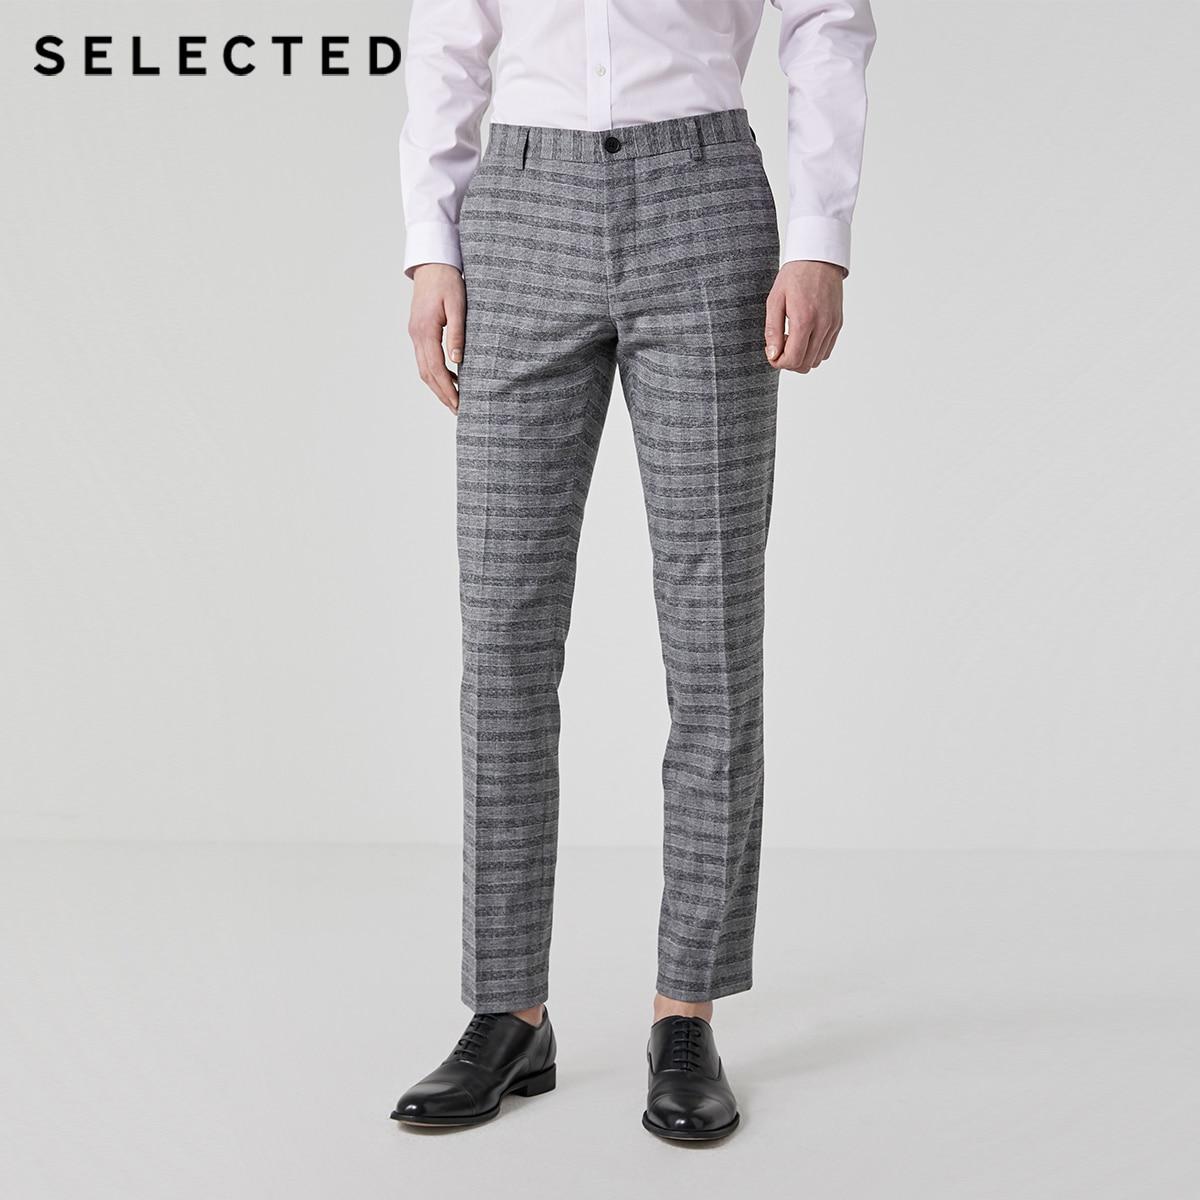 SELECTED Men's Summer Slim Straight Fit Plaid Suit Pants T|41926A504